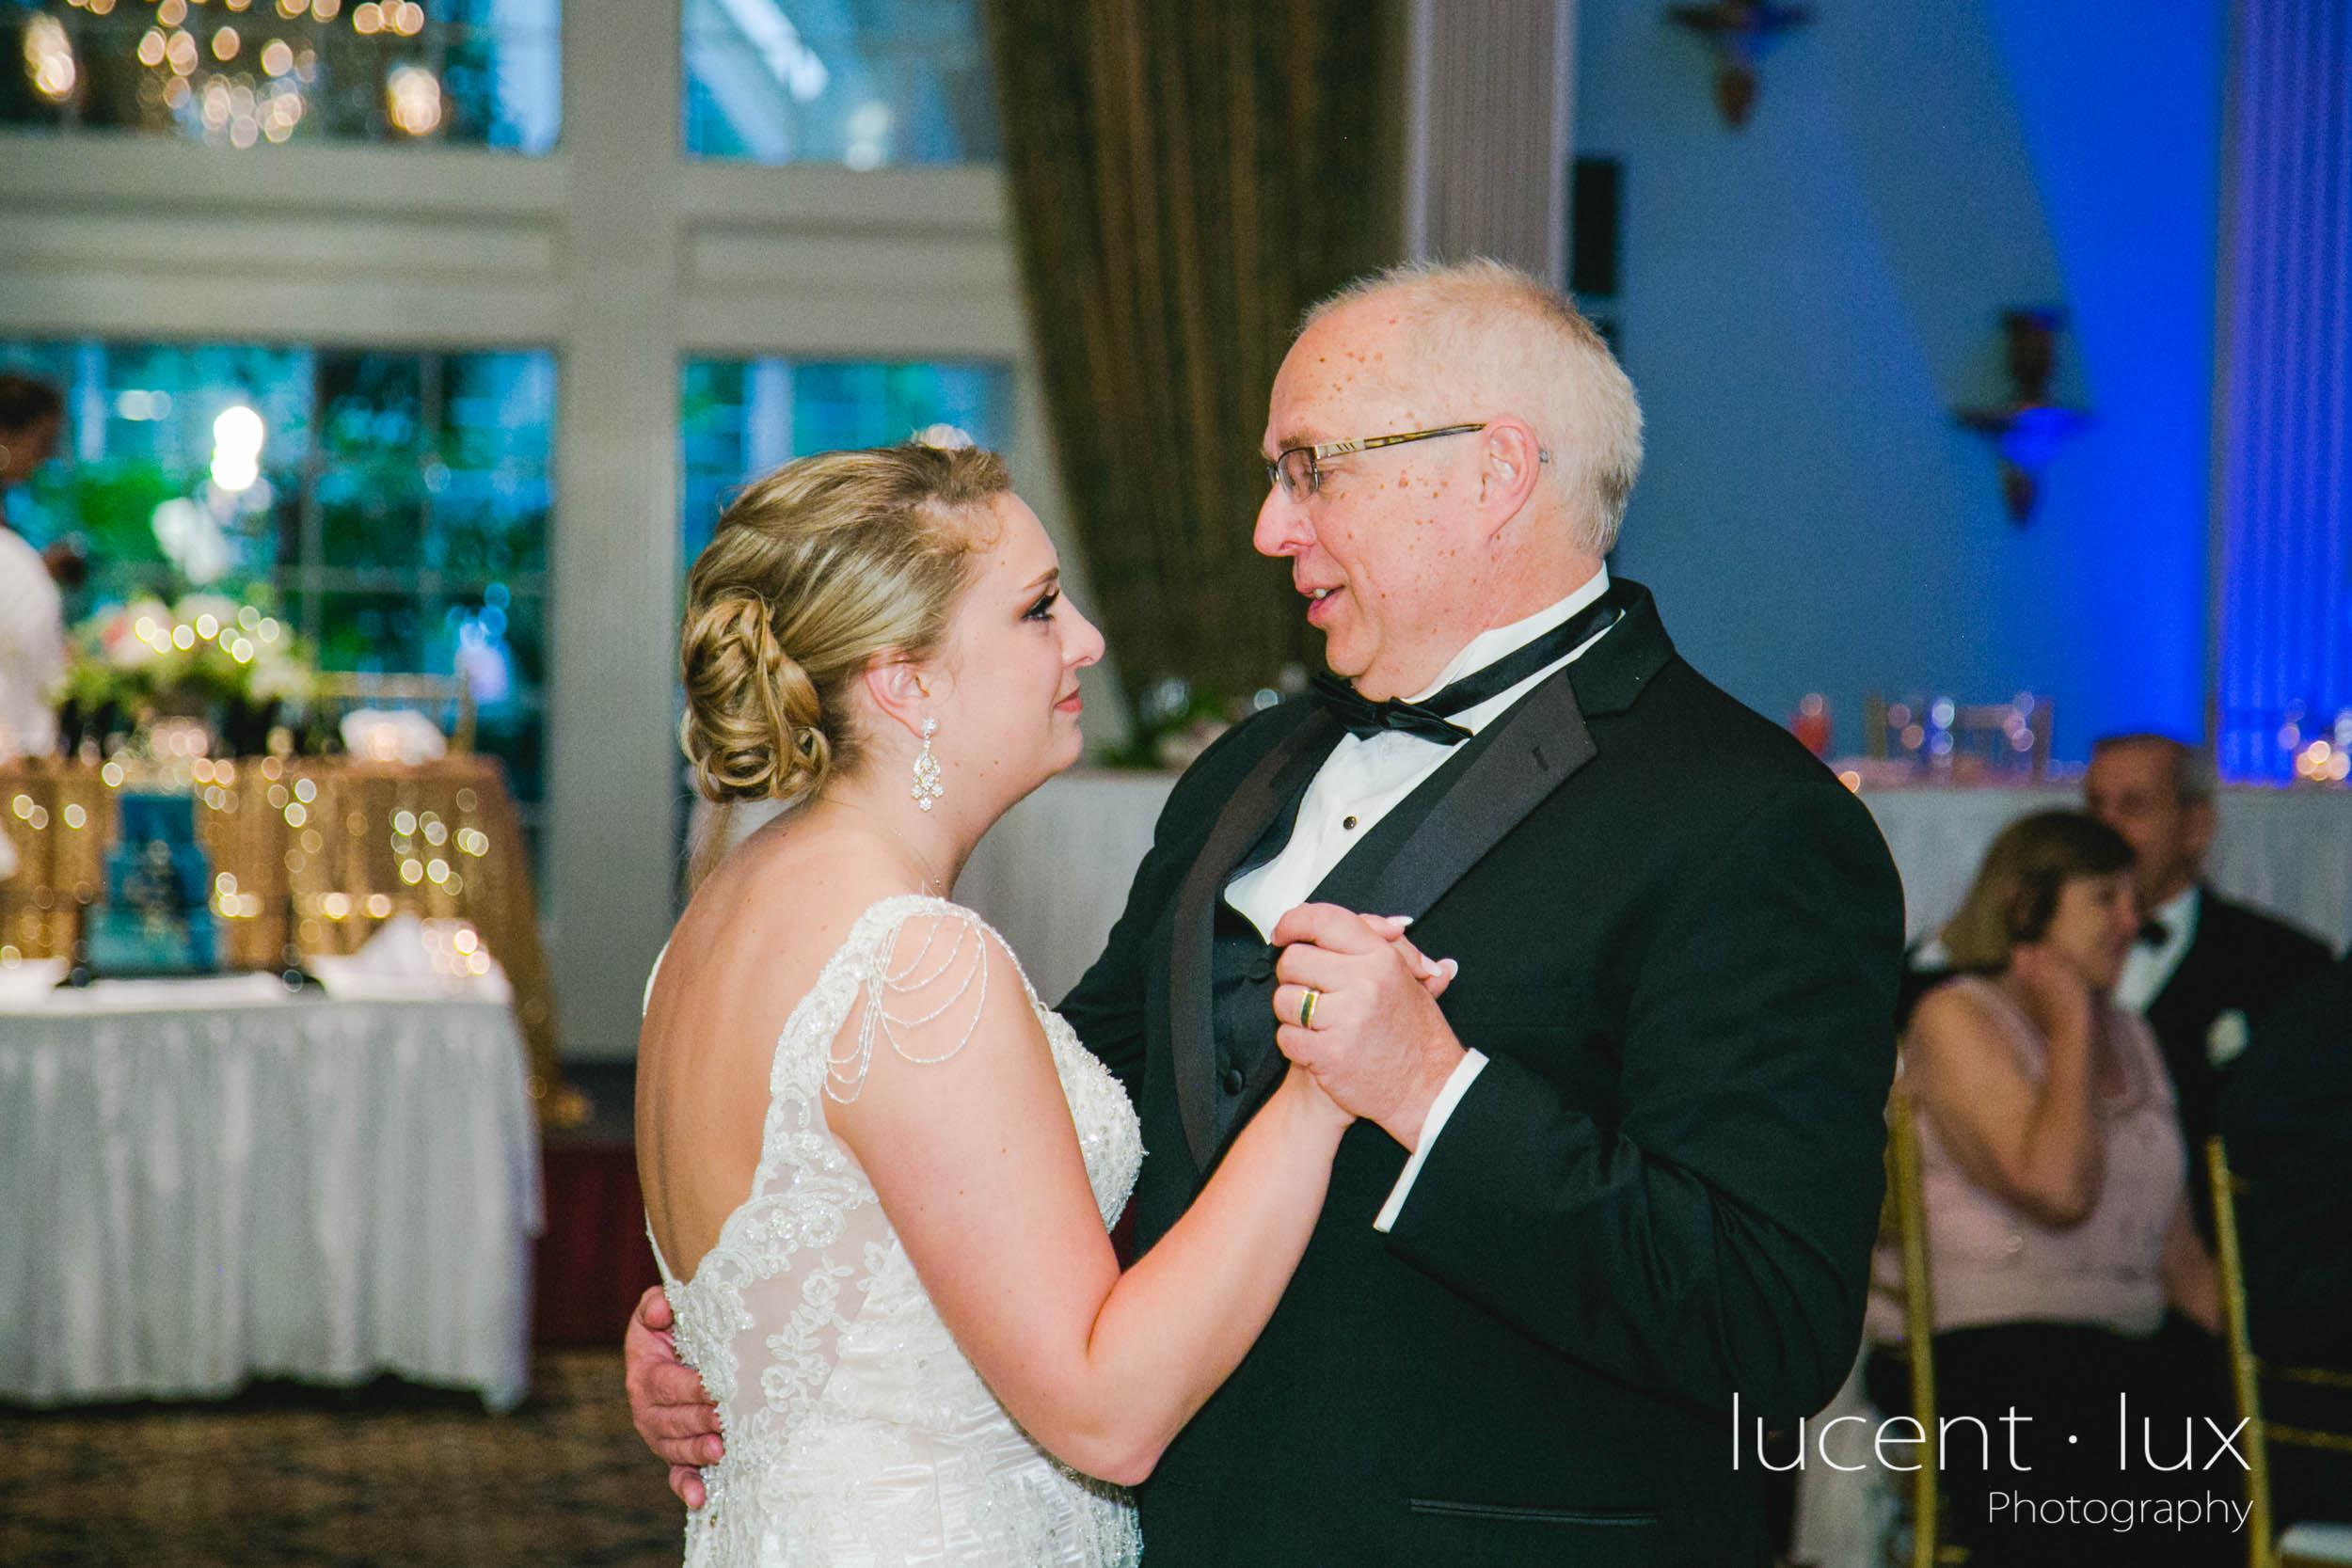 Wedding-Photography-Maryland-Pennsylvania-Photographer-Mendenhall-Inn-Media-Portrait-Event-154.jpg